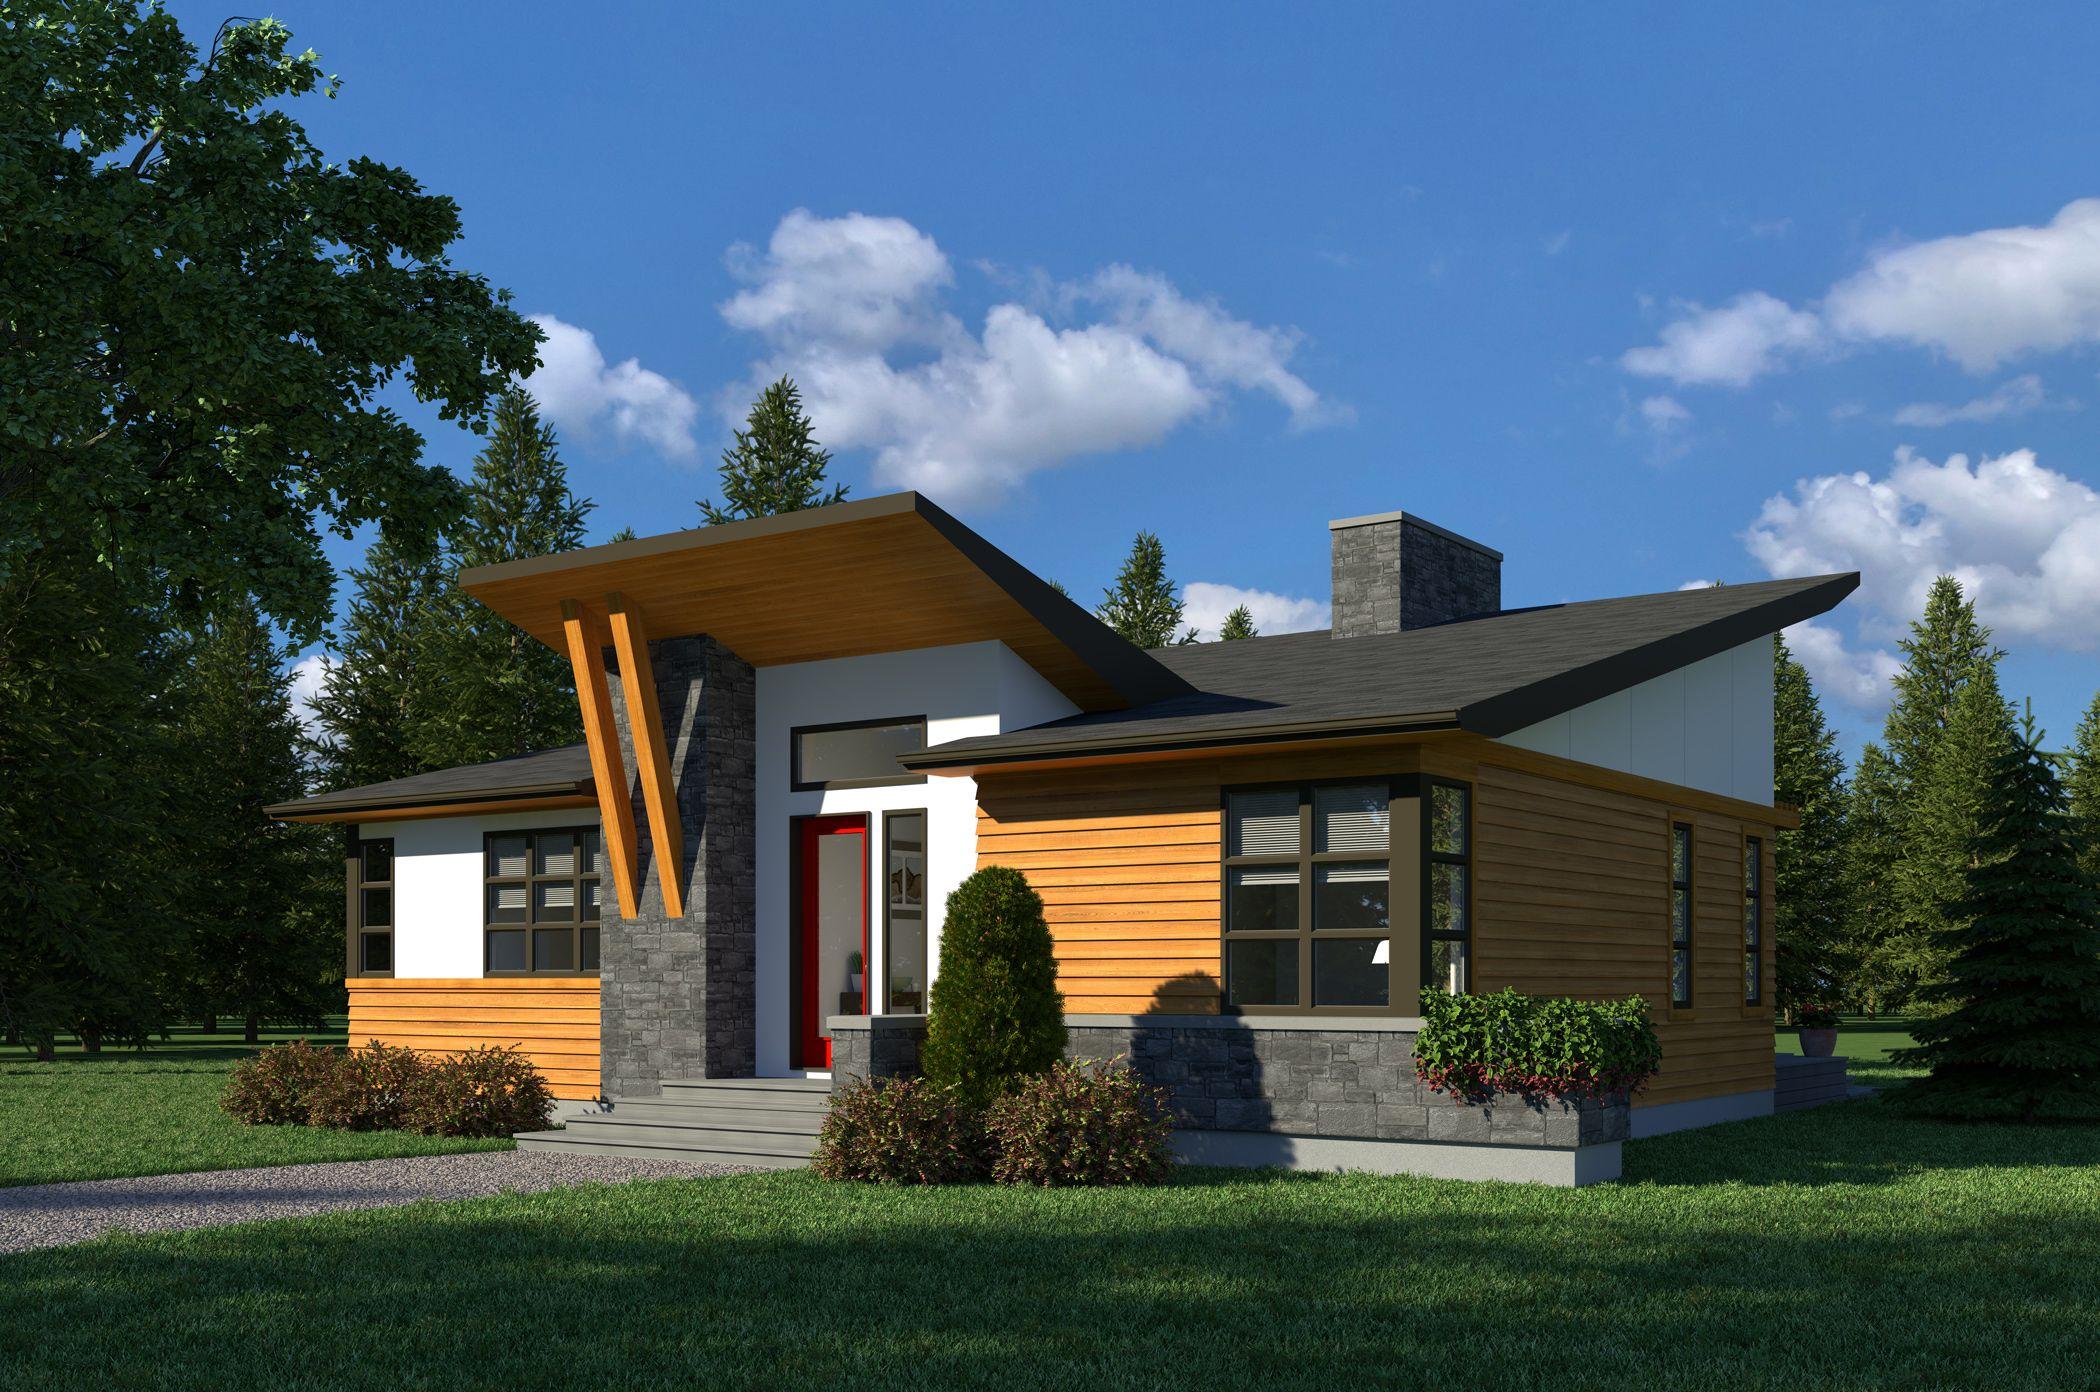 Tiny Home Designs: Contemporary Monarch-1650 In 2019